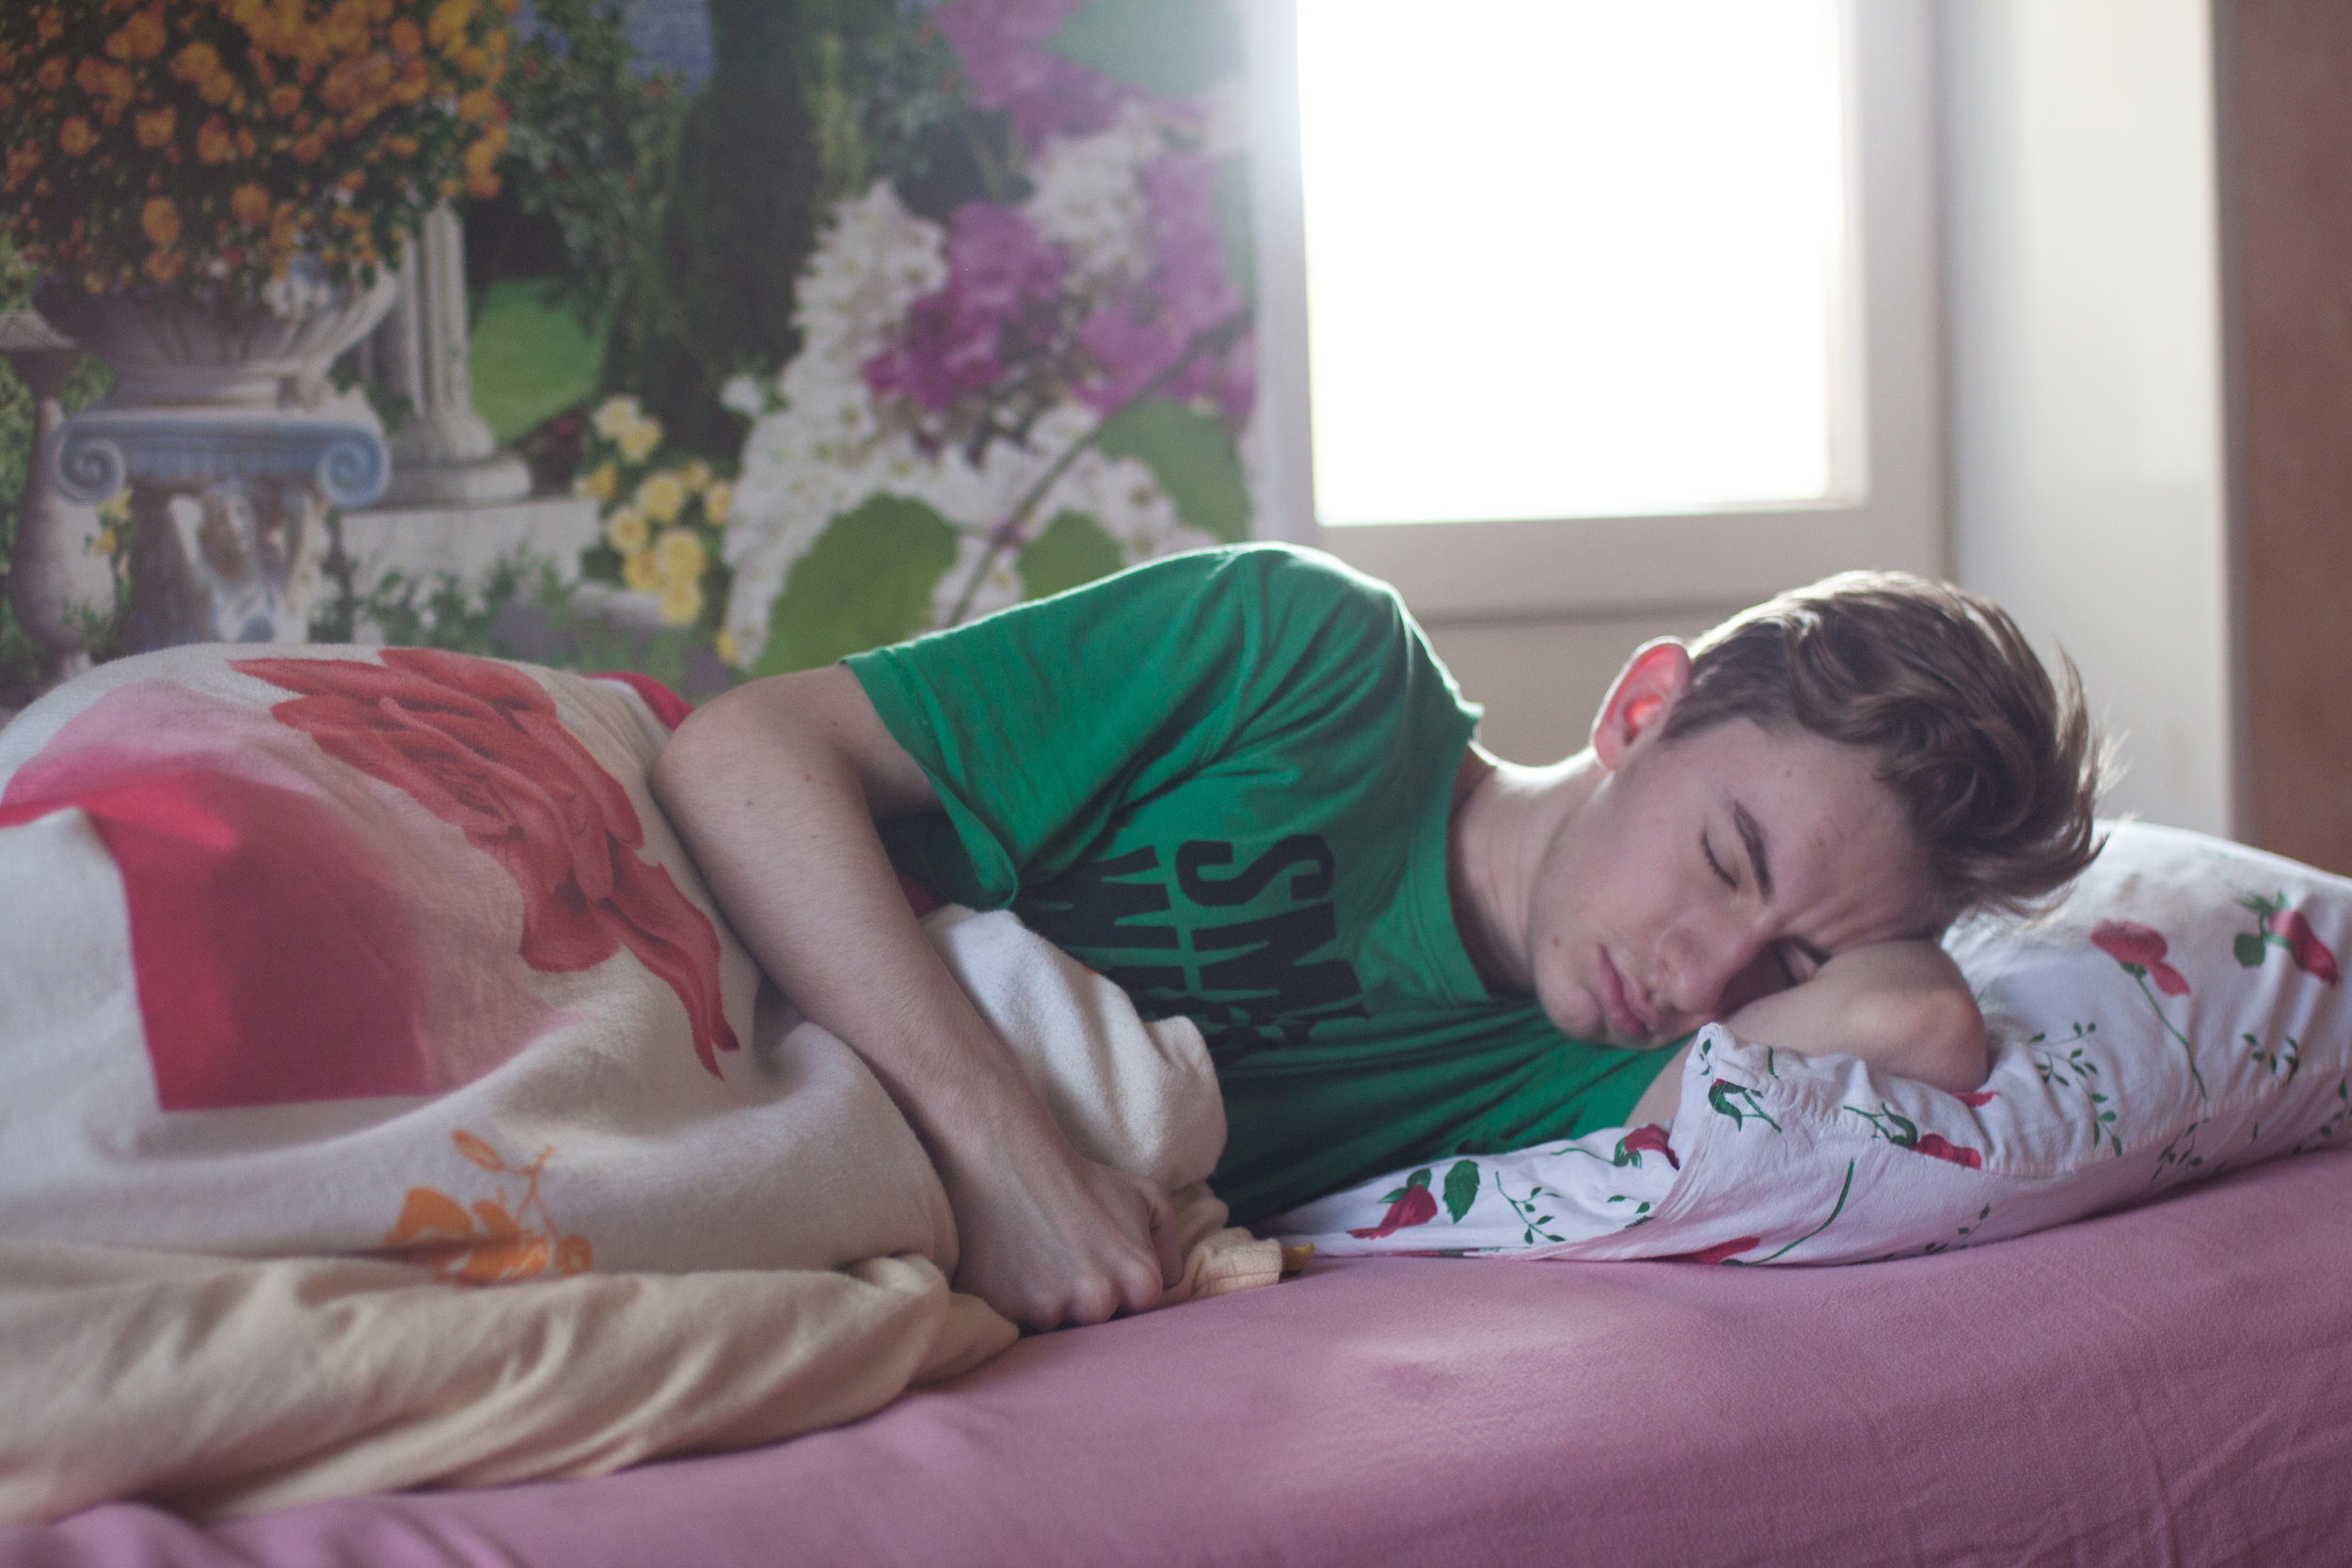 Young man sleeping.jpeg